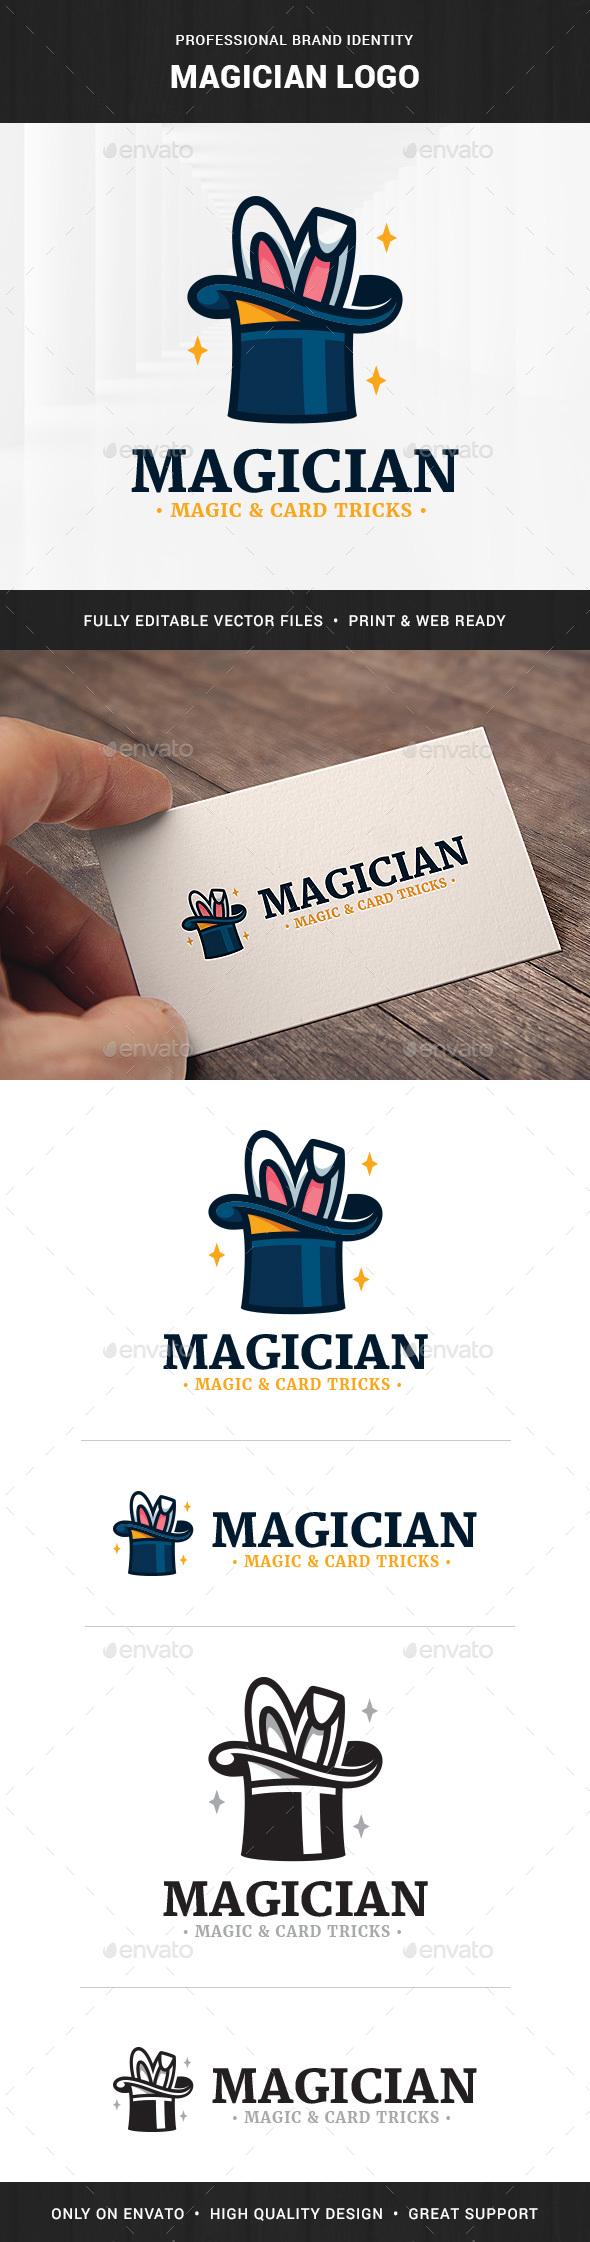 Magician Logo Template